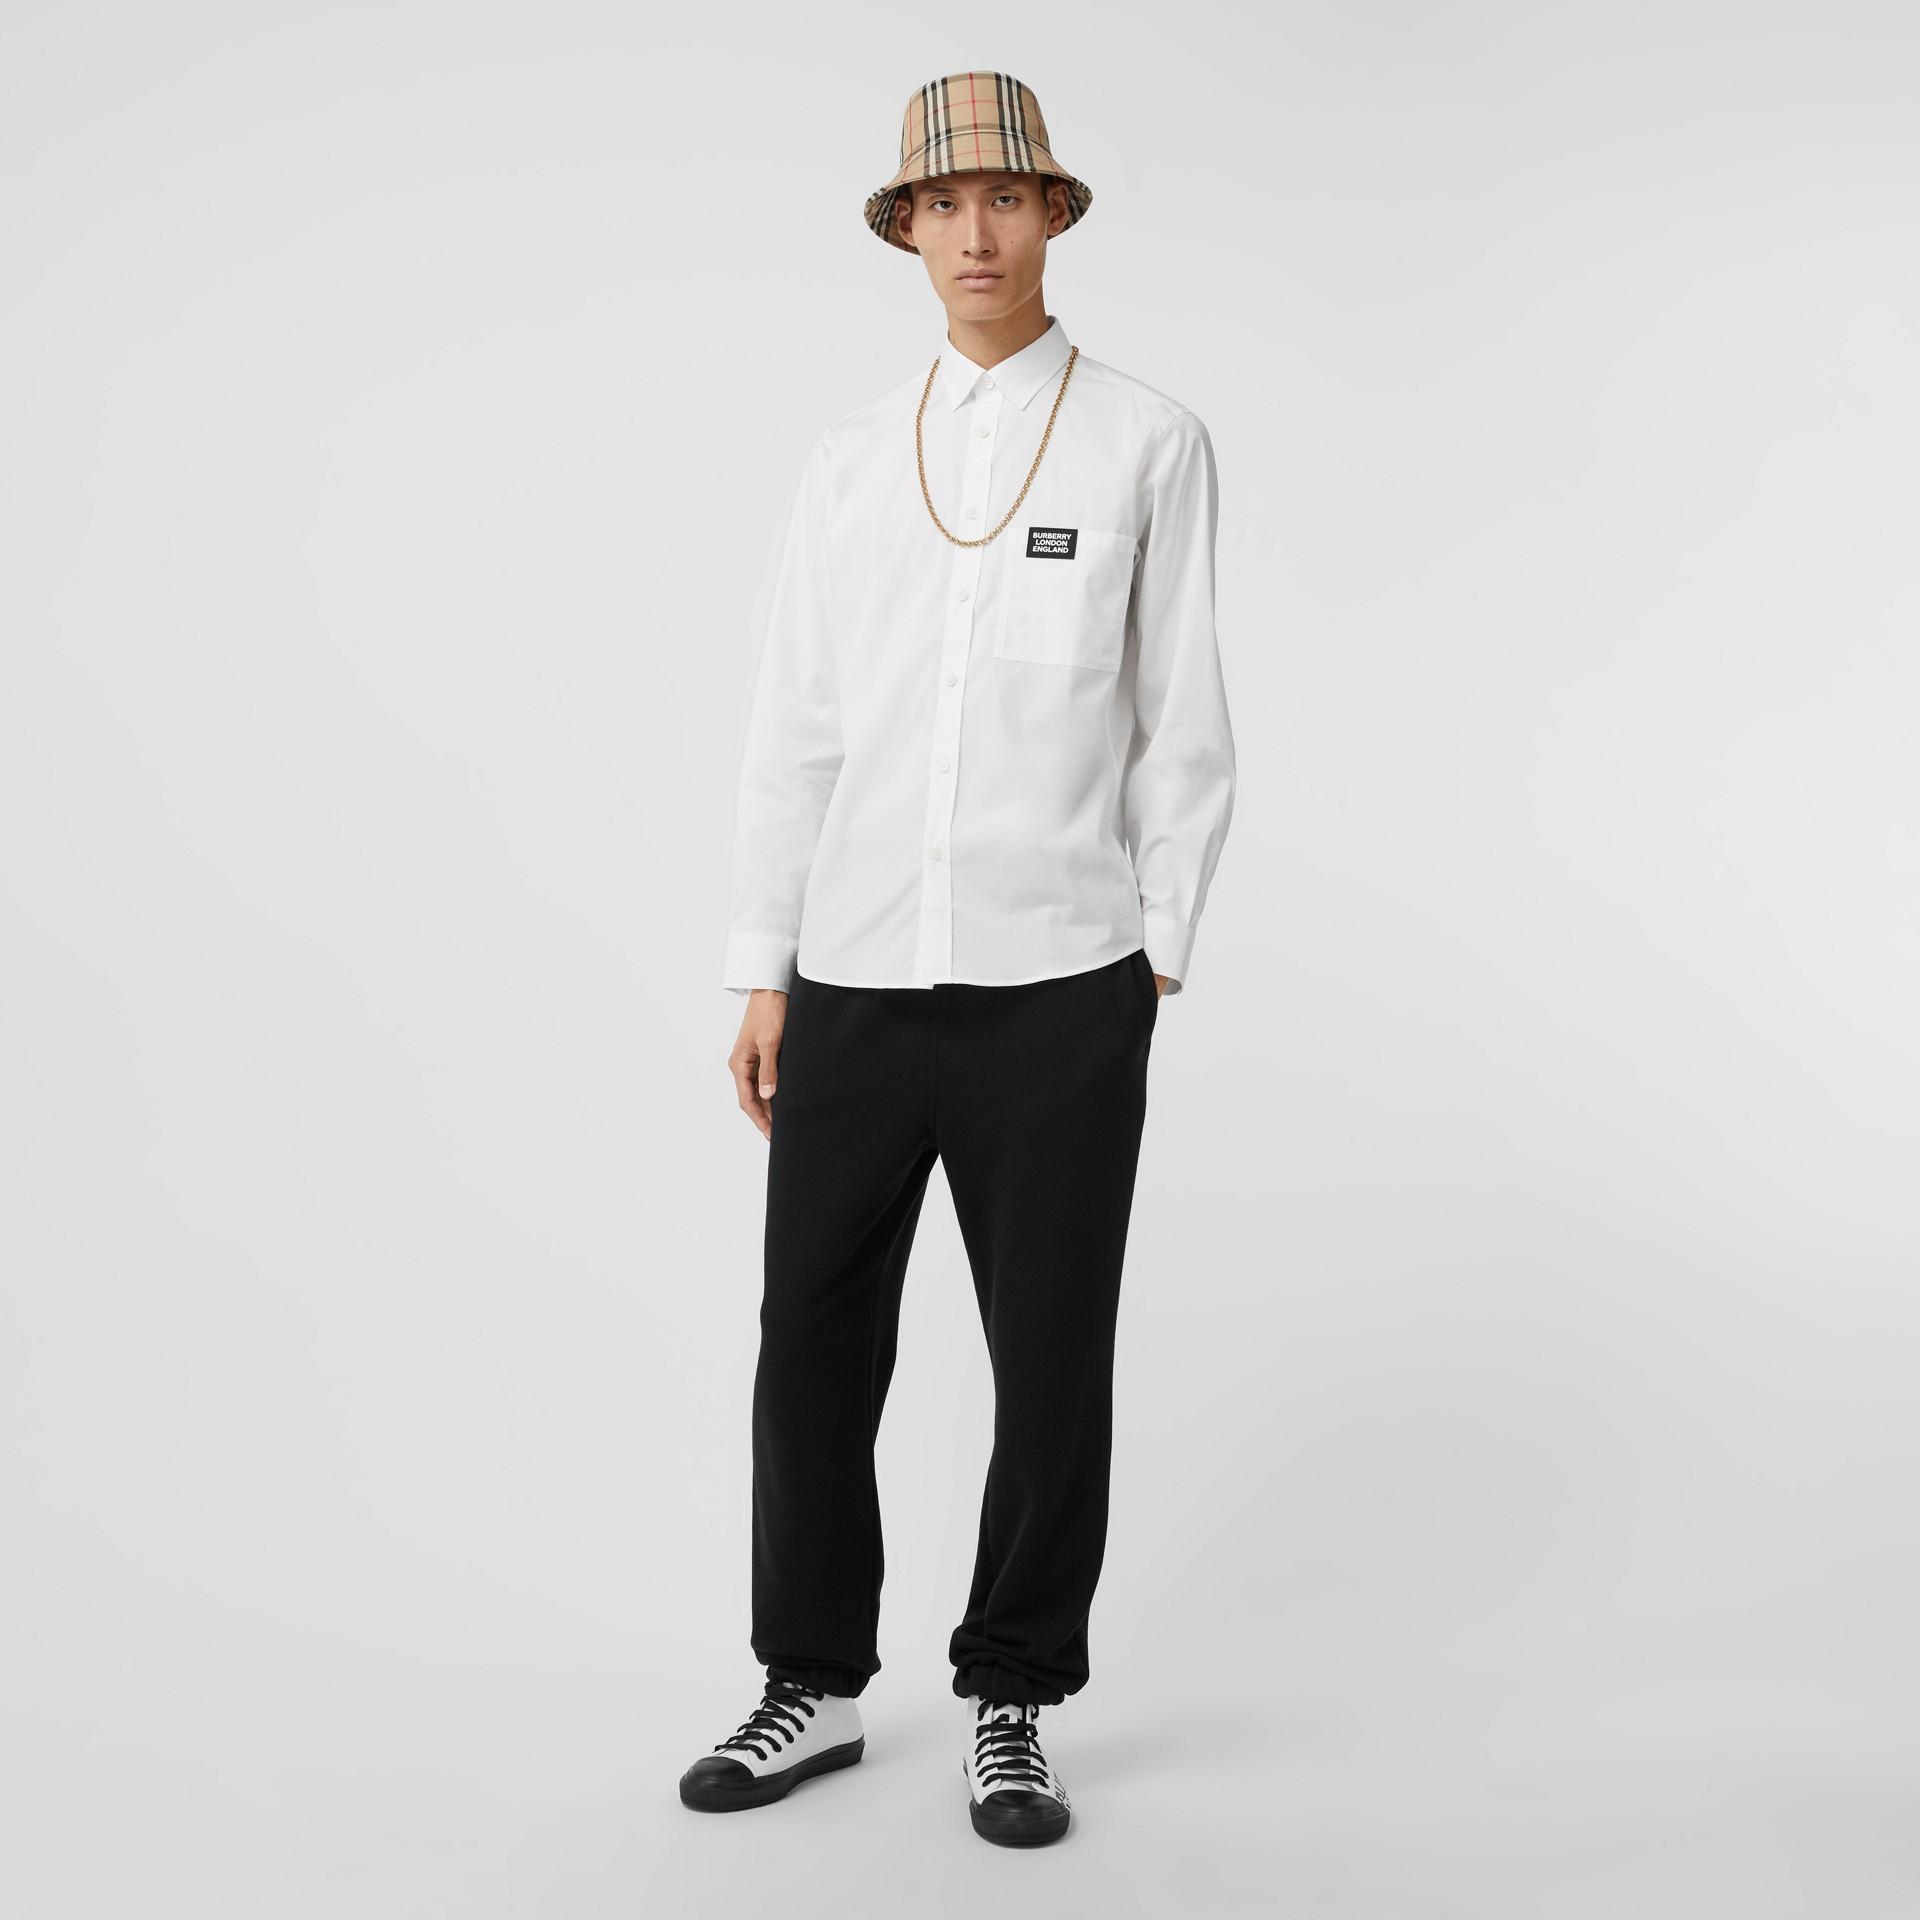 Logo Detail Stretch Cotton Poplin Shirt in White - Men | Burberry United Kingdom - gallery image 4